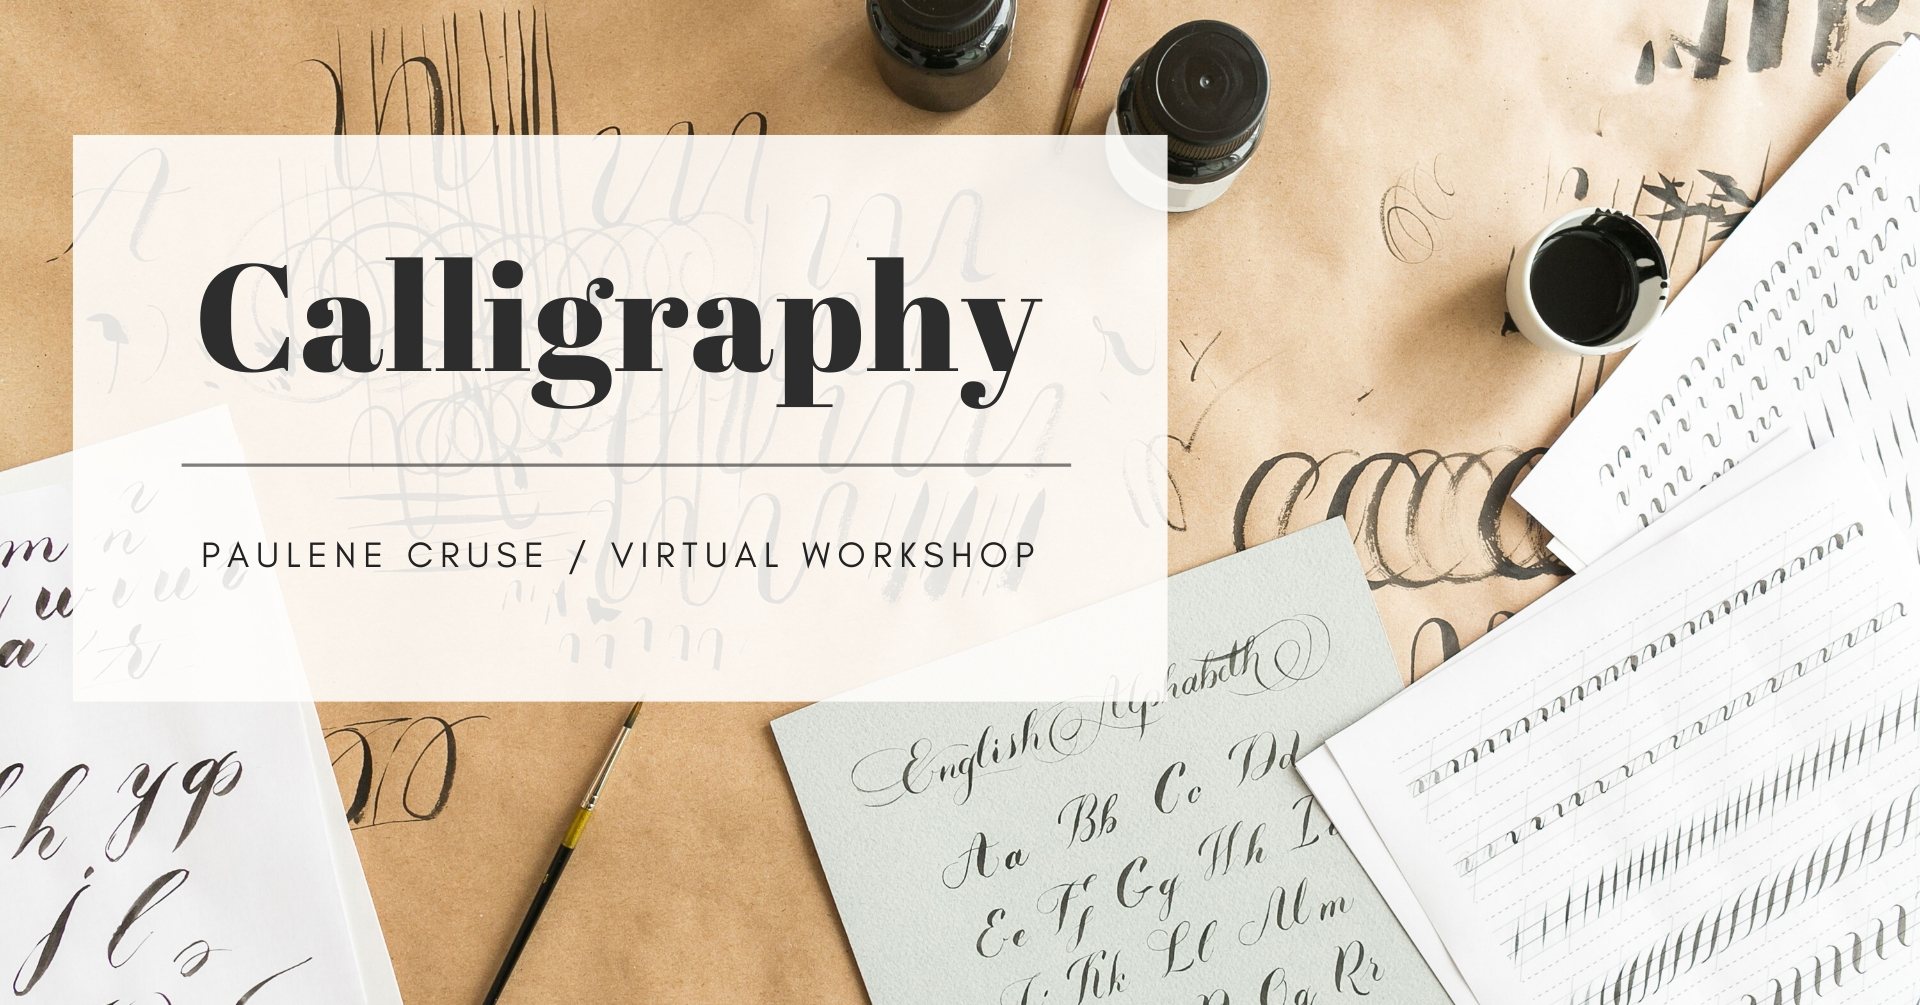 Calligraphy Workshop with Paulene Cruse